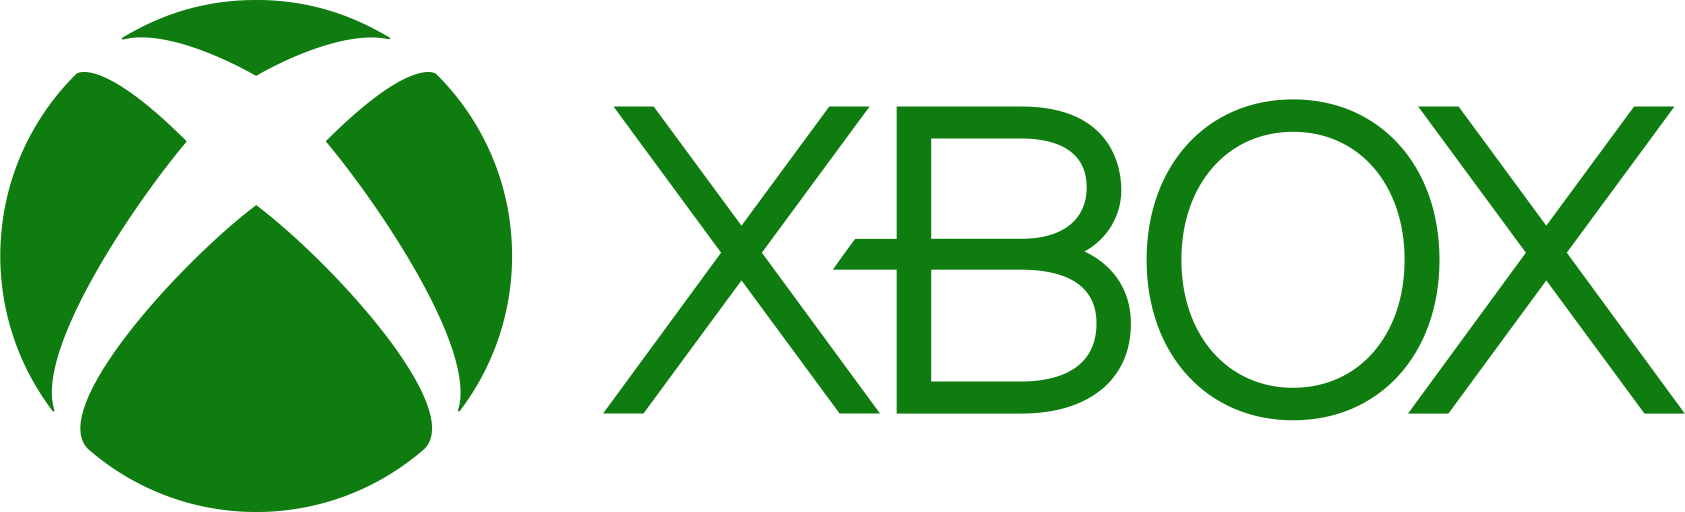 Xbox Logo transparent PNG.